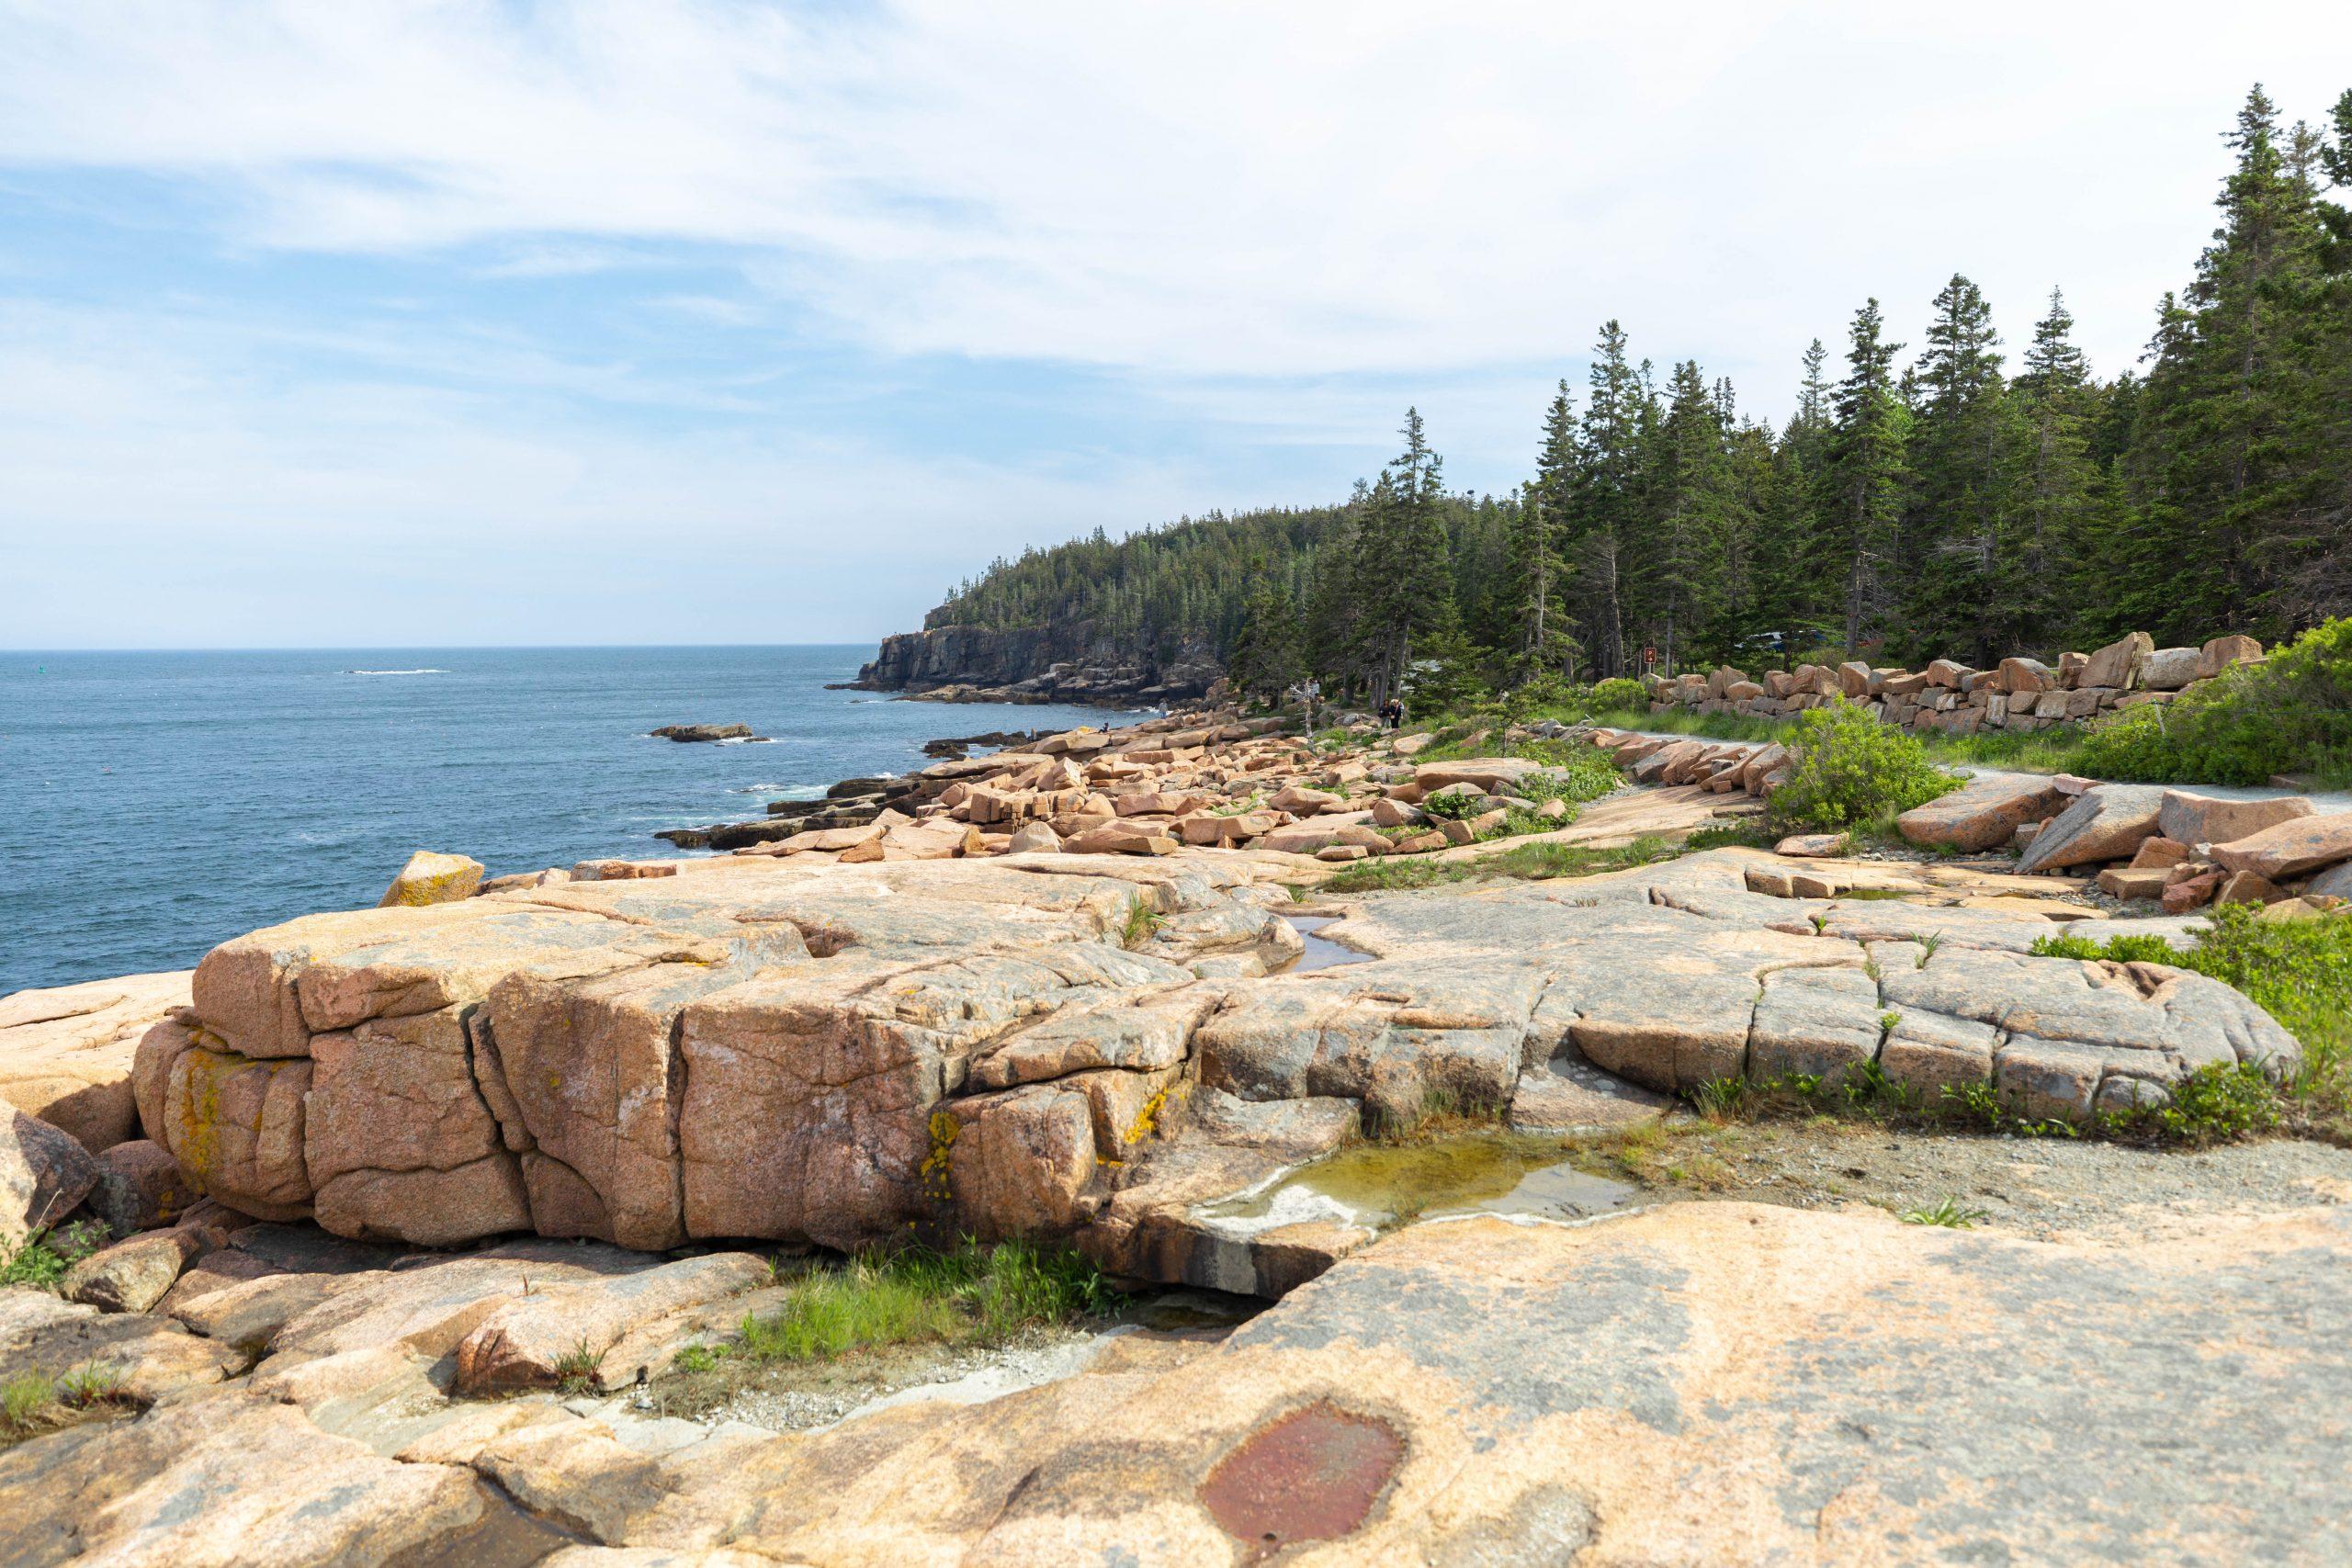 Acadia National Park Mount Desert Island near Bar Harbor Maine Written and Photographed by Luxury Travel Writer Annie Fairfax